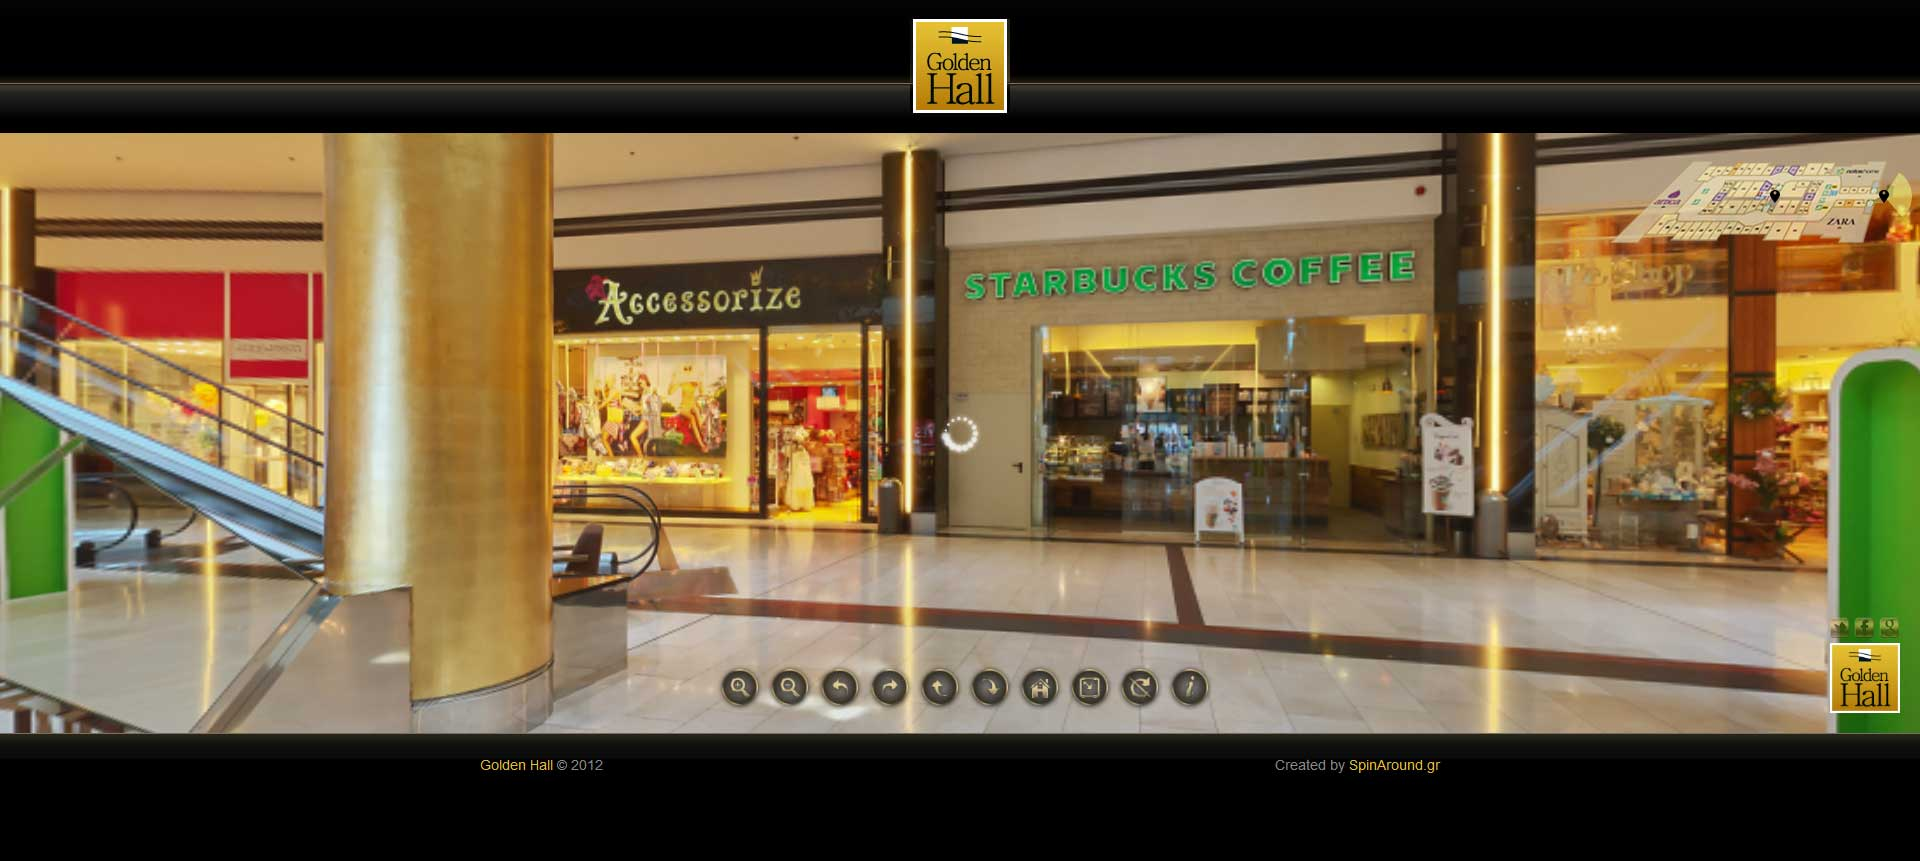 6a12c1d4235 Fashion Locals: Πλοήγηση στα καταστήματα μόδας της Ευρώπης